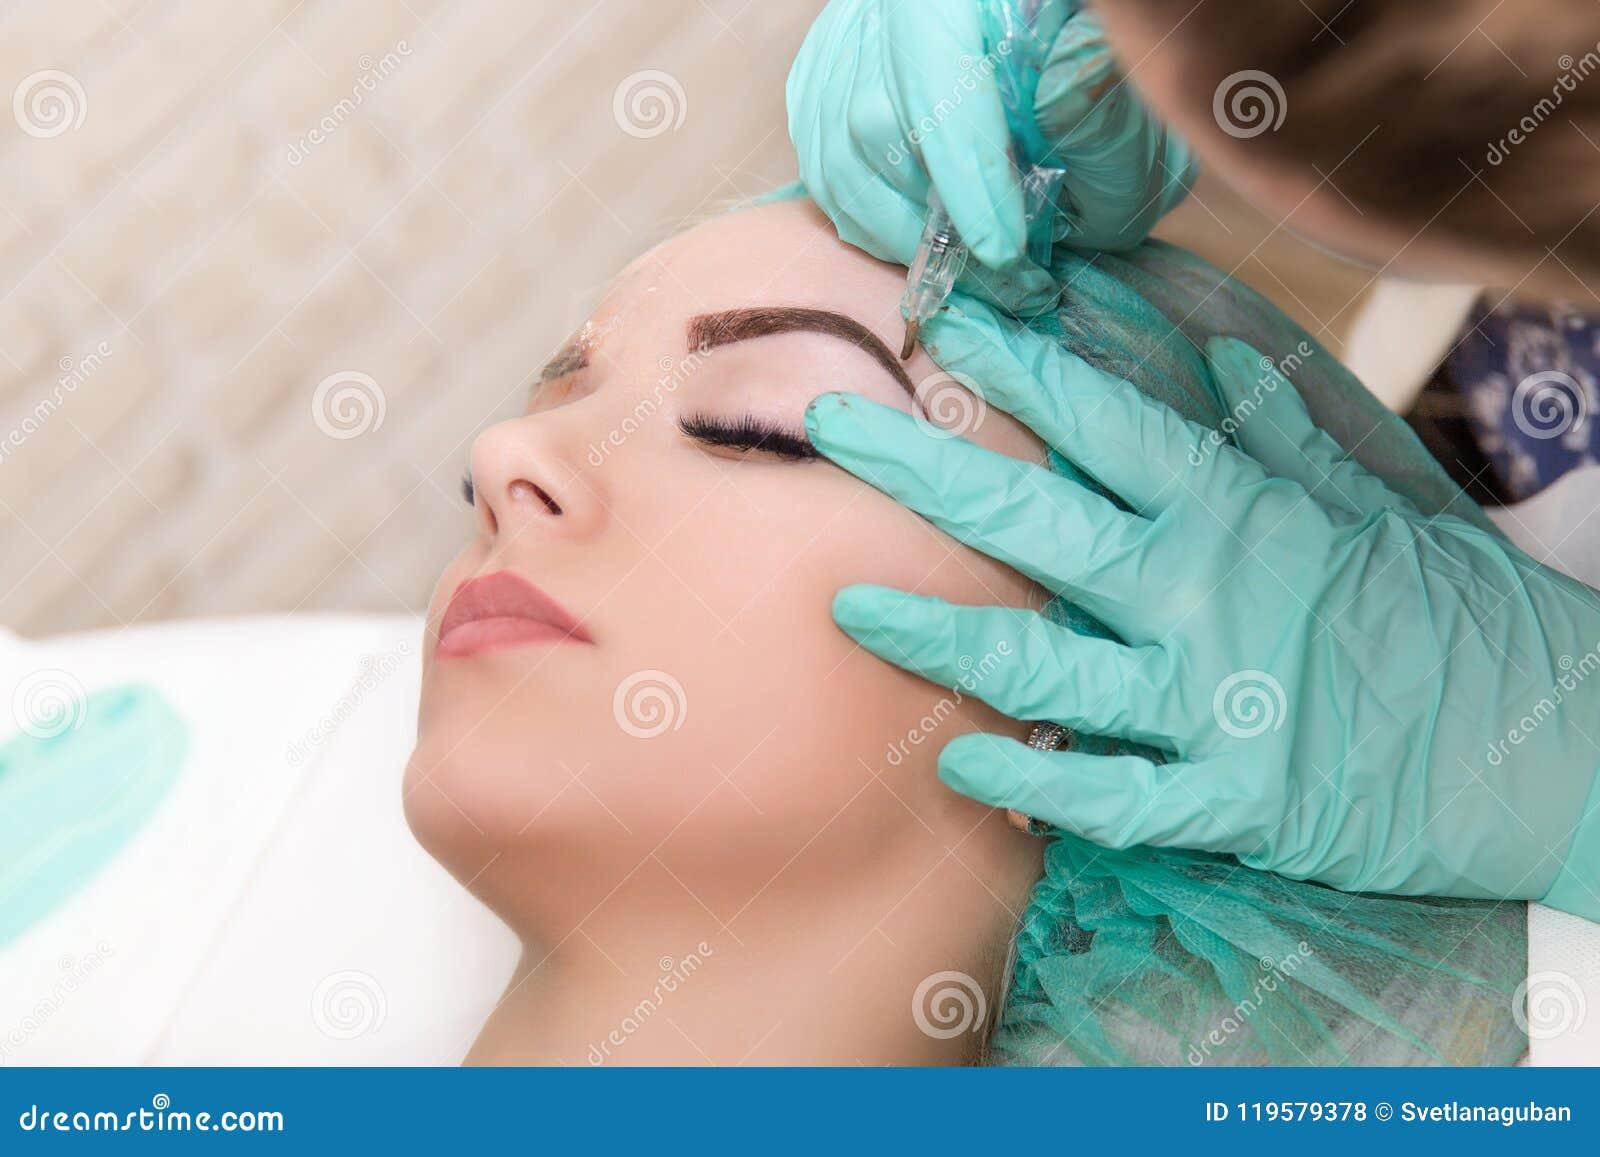 Microblading眼眉在美容院的工作流程